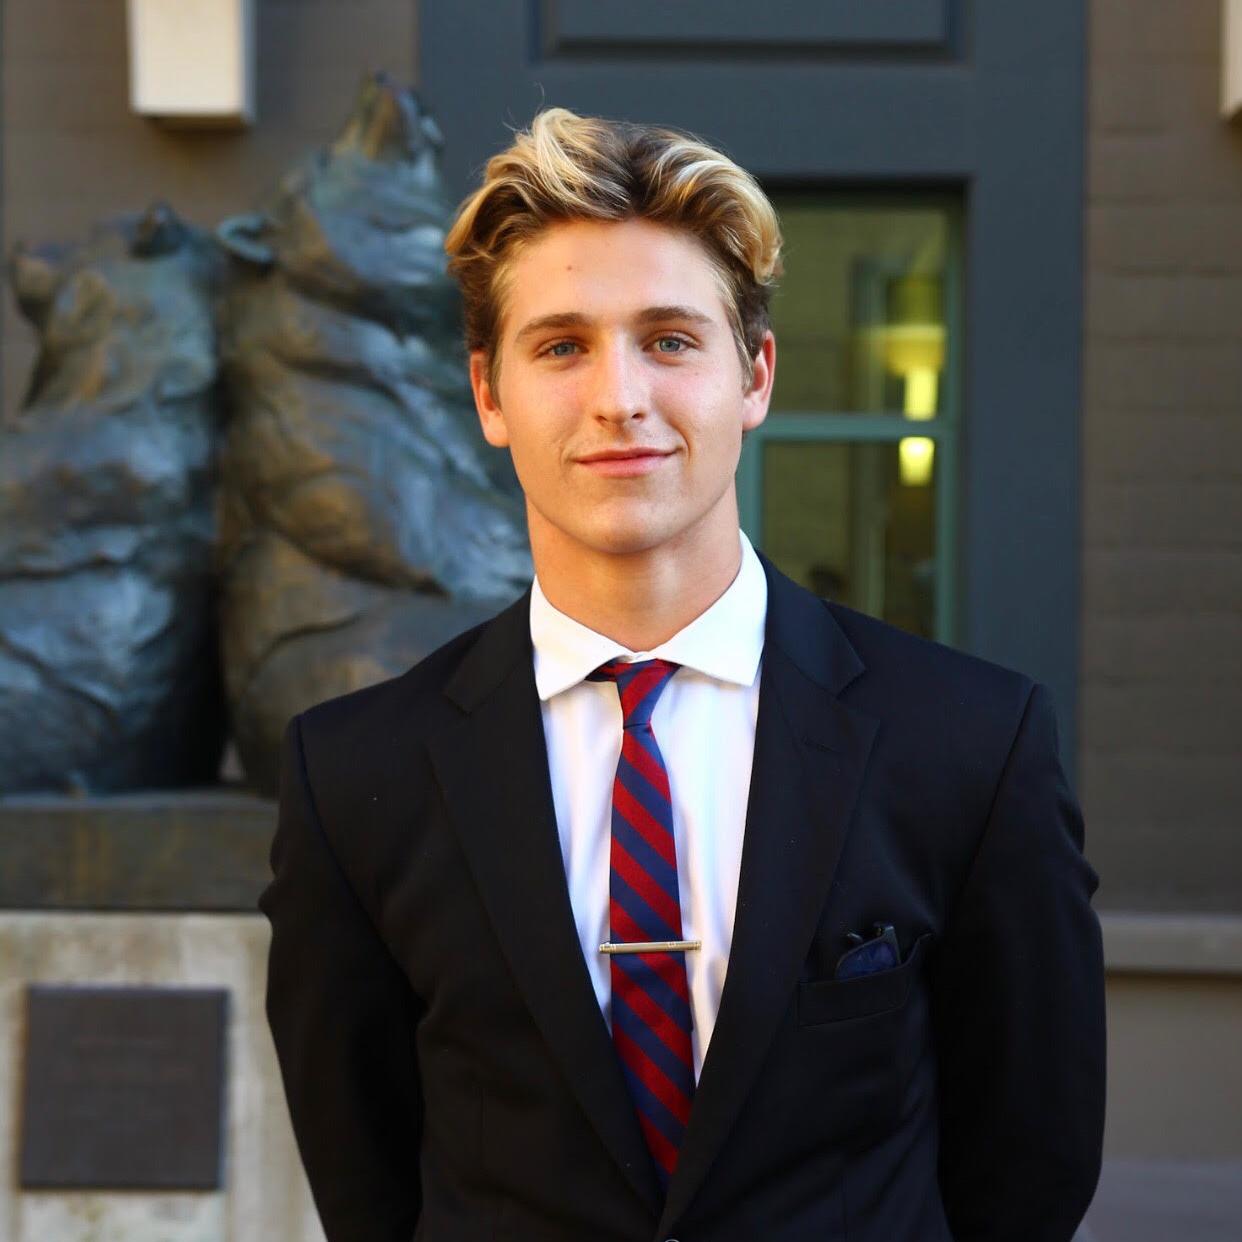 Grant Sutter from UC Berkeley